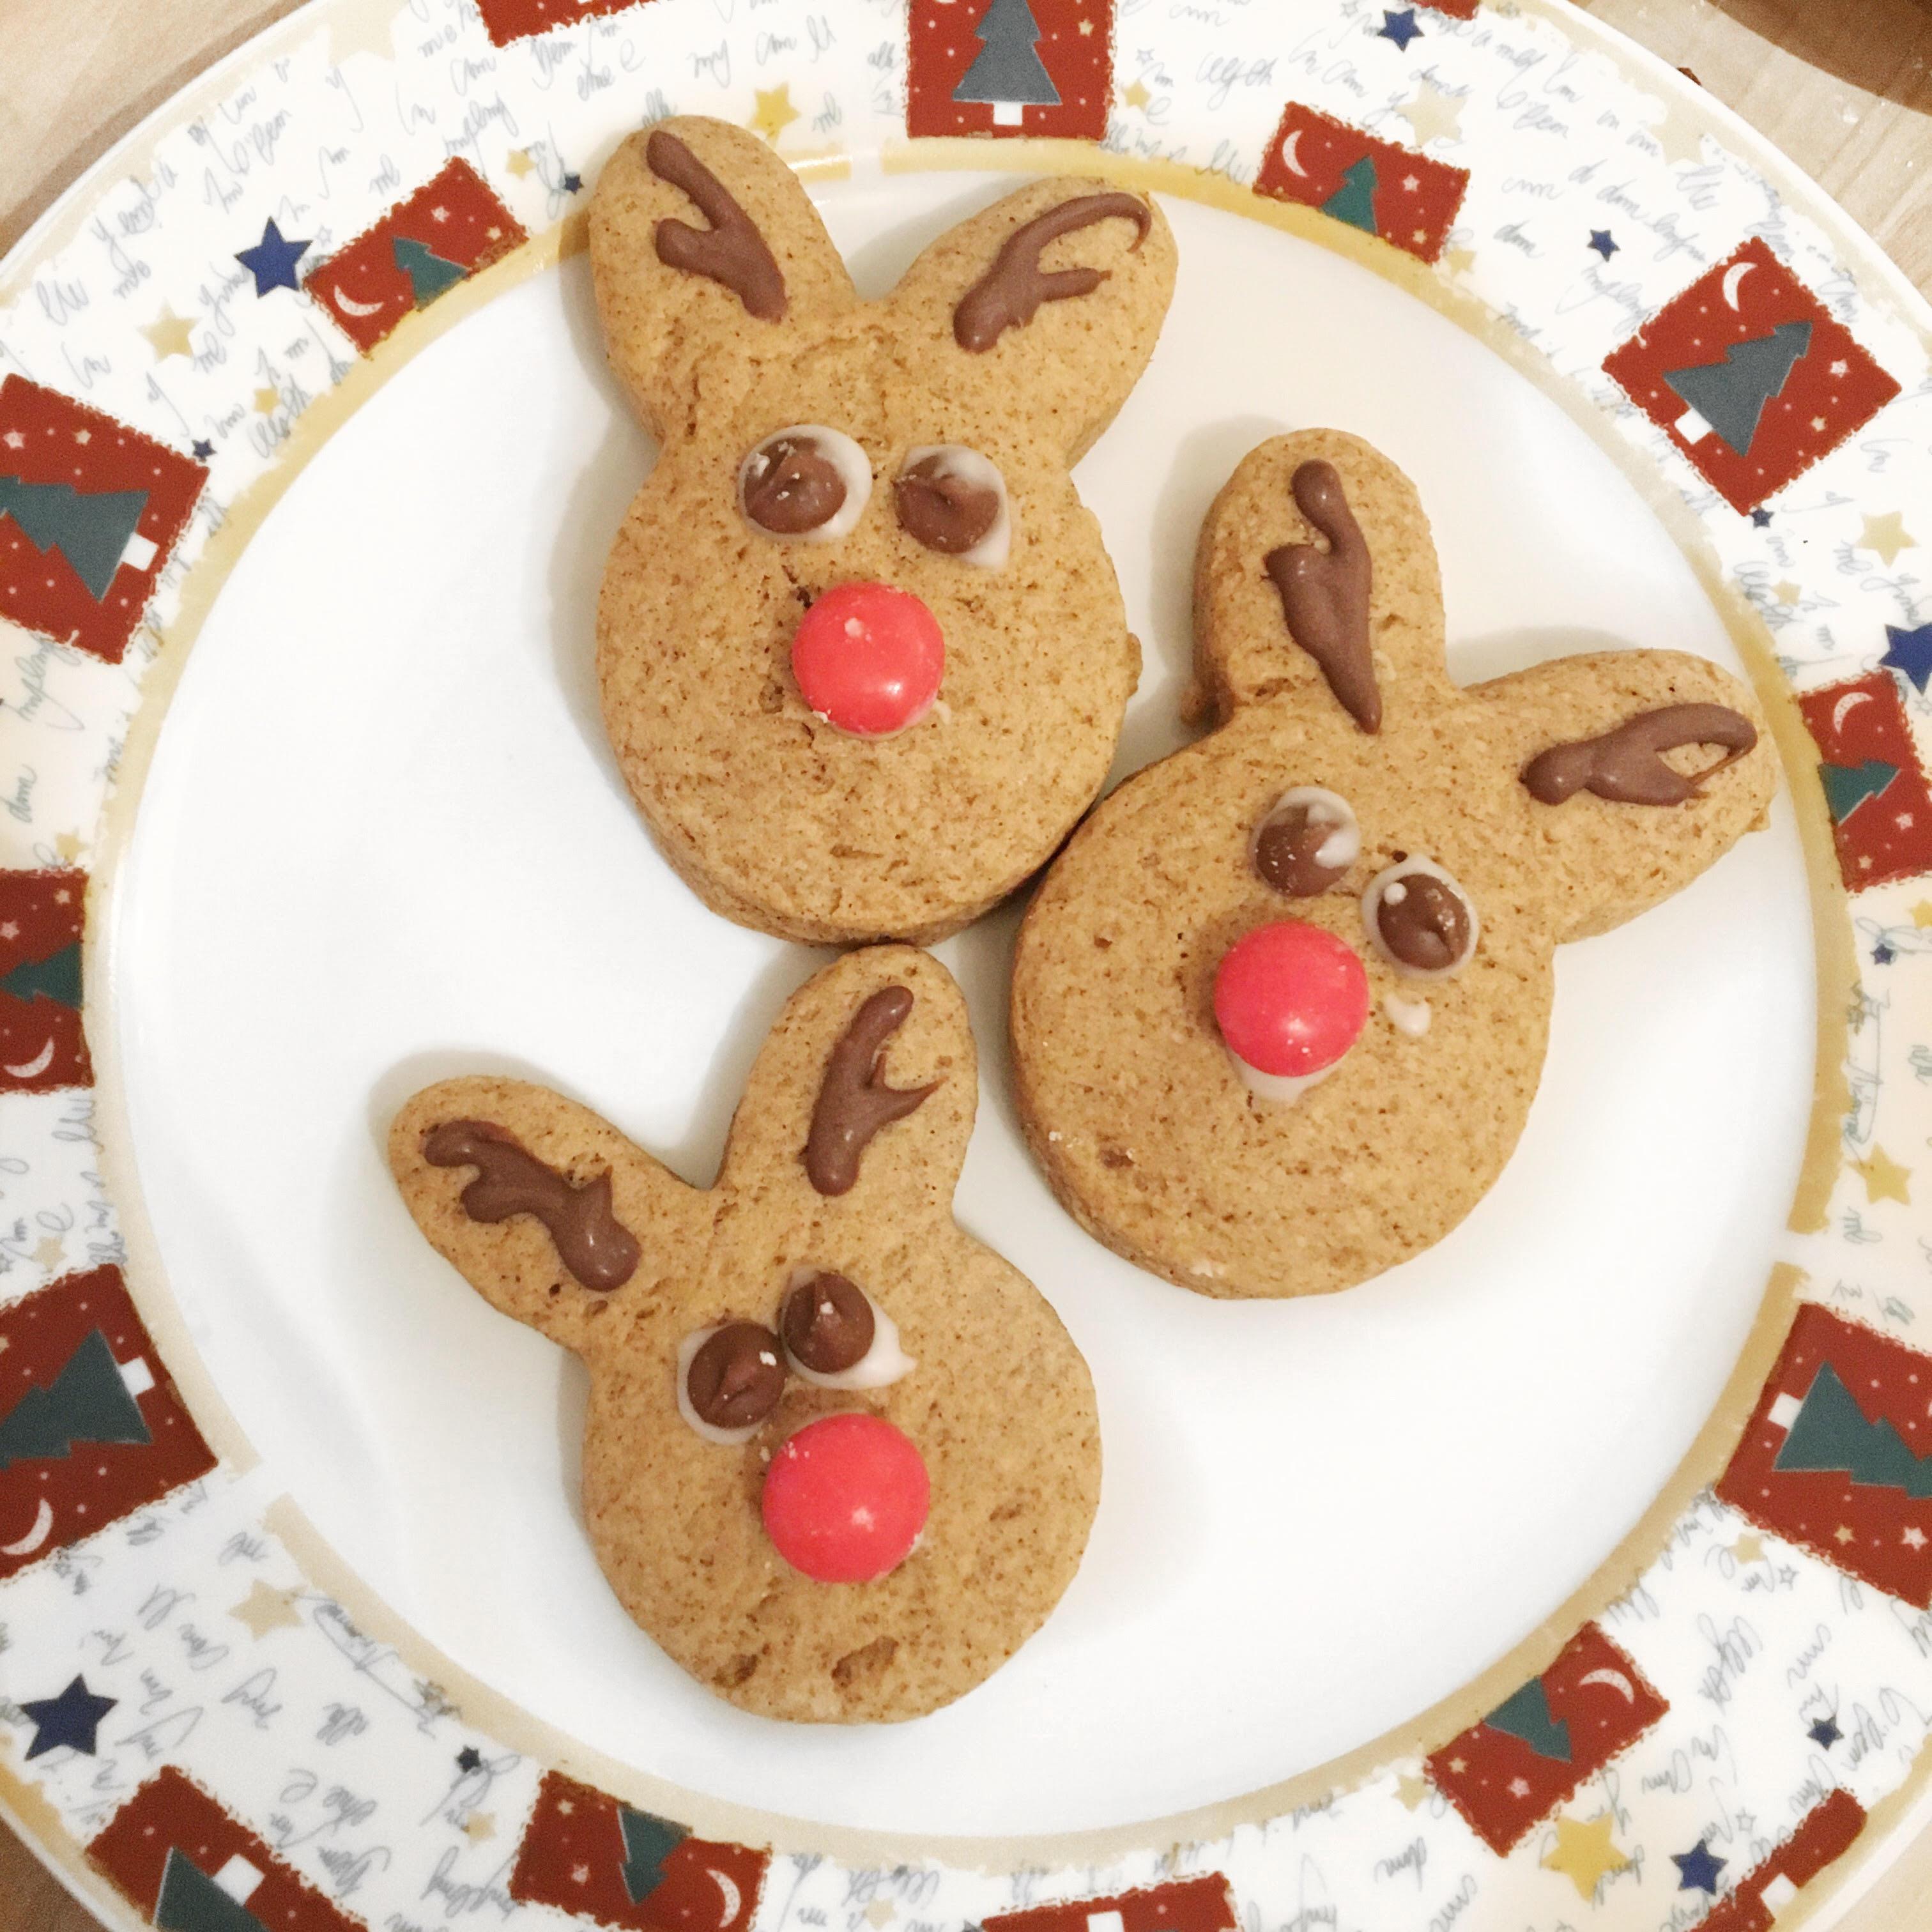 Blogmas Day 24: How to Bake Reindeer Cookies